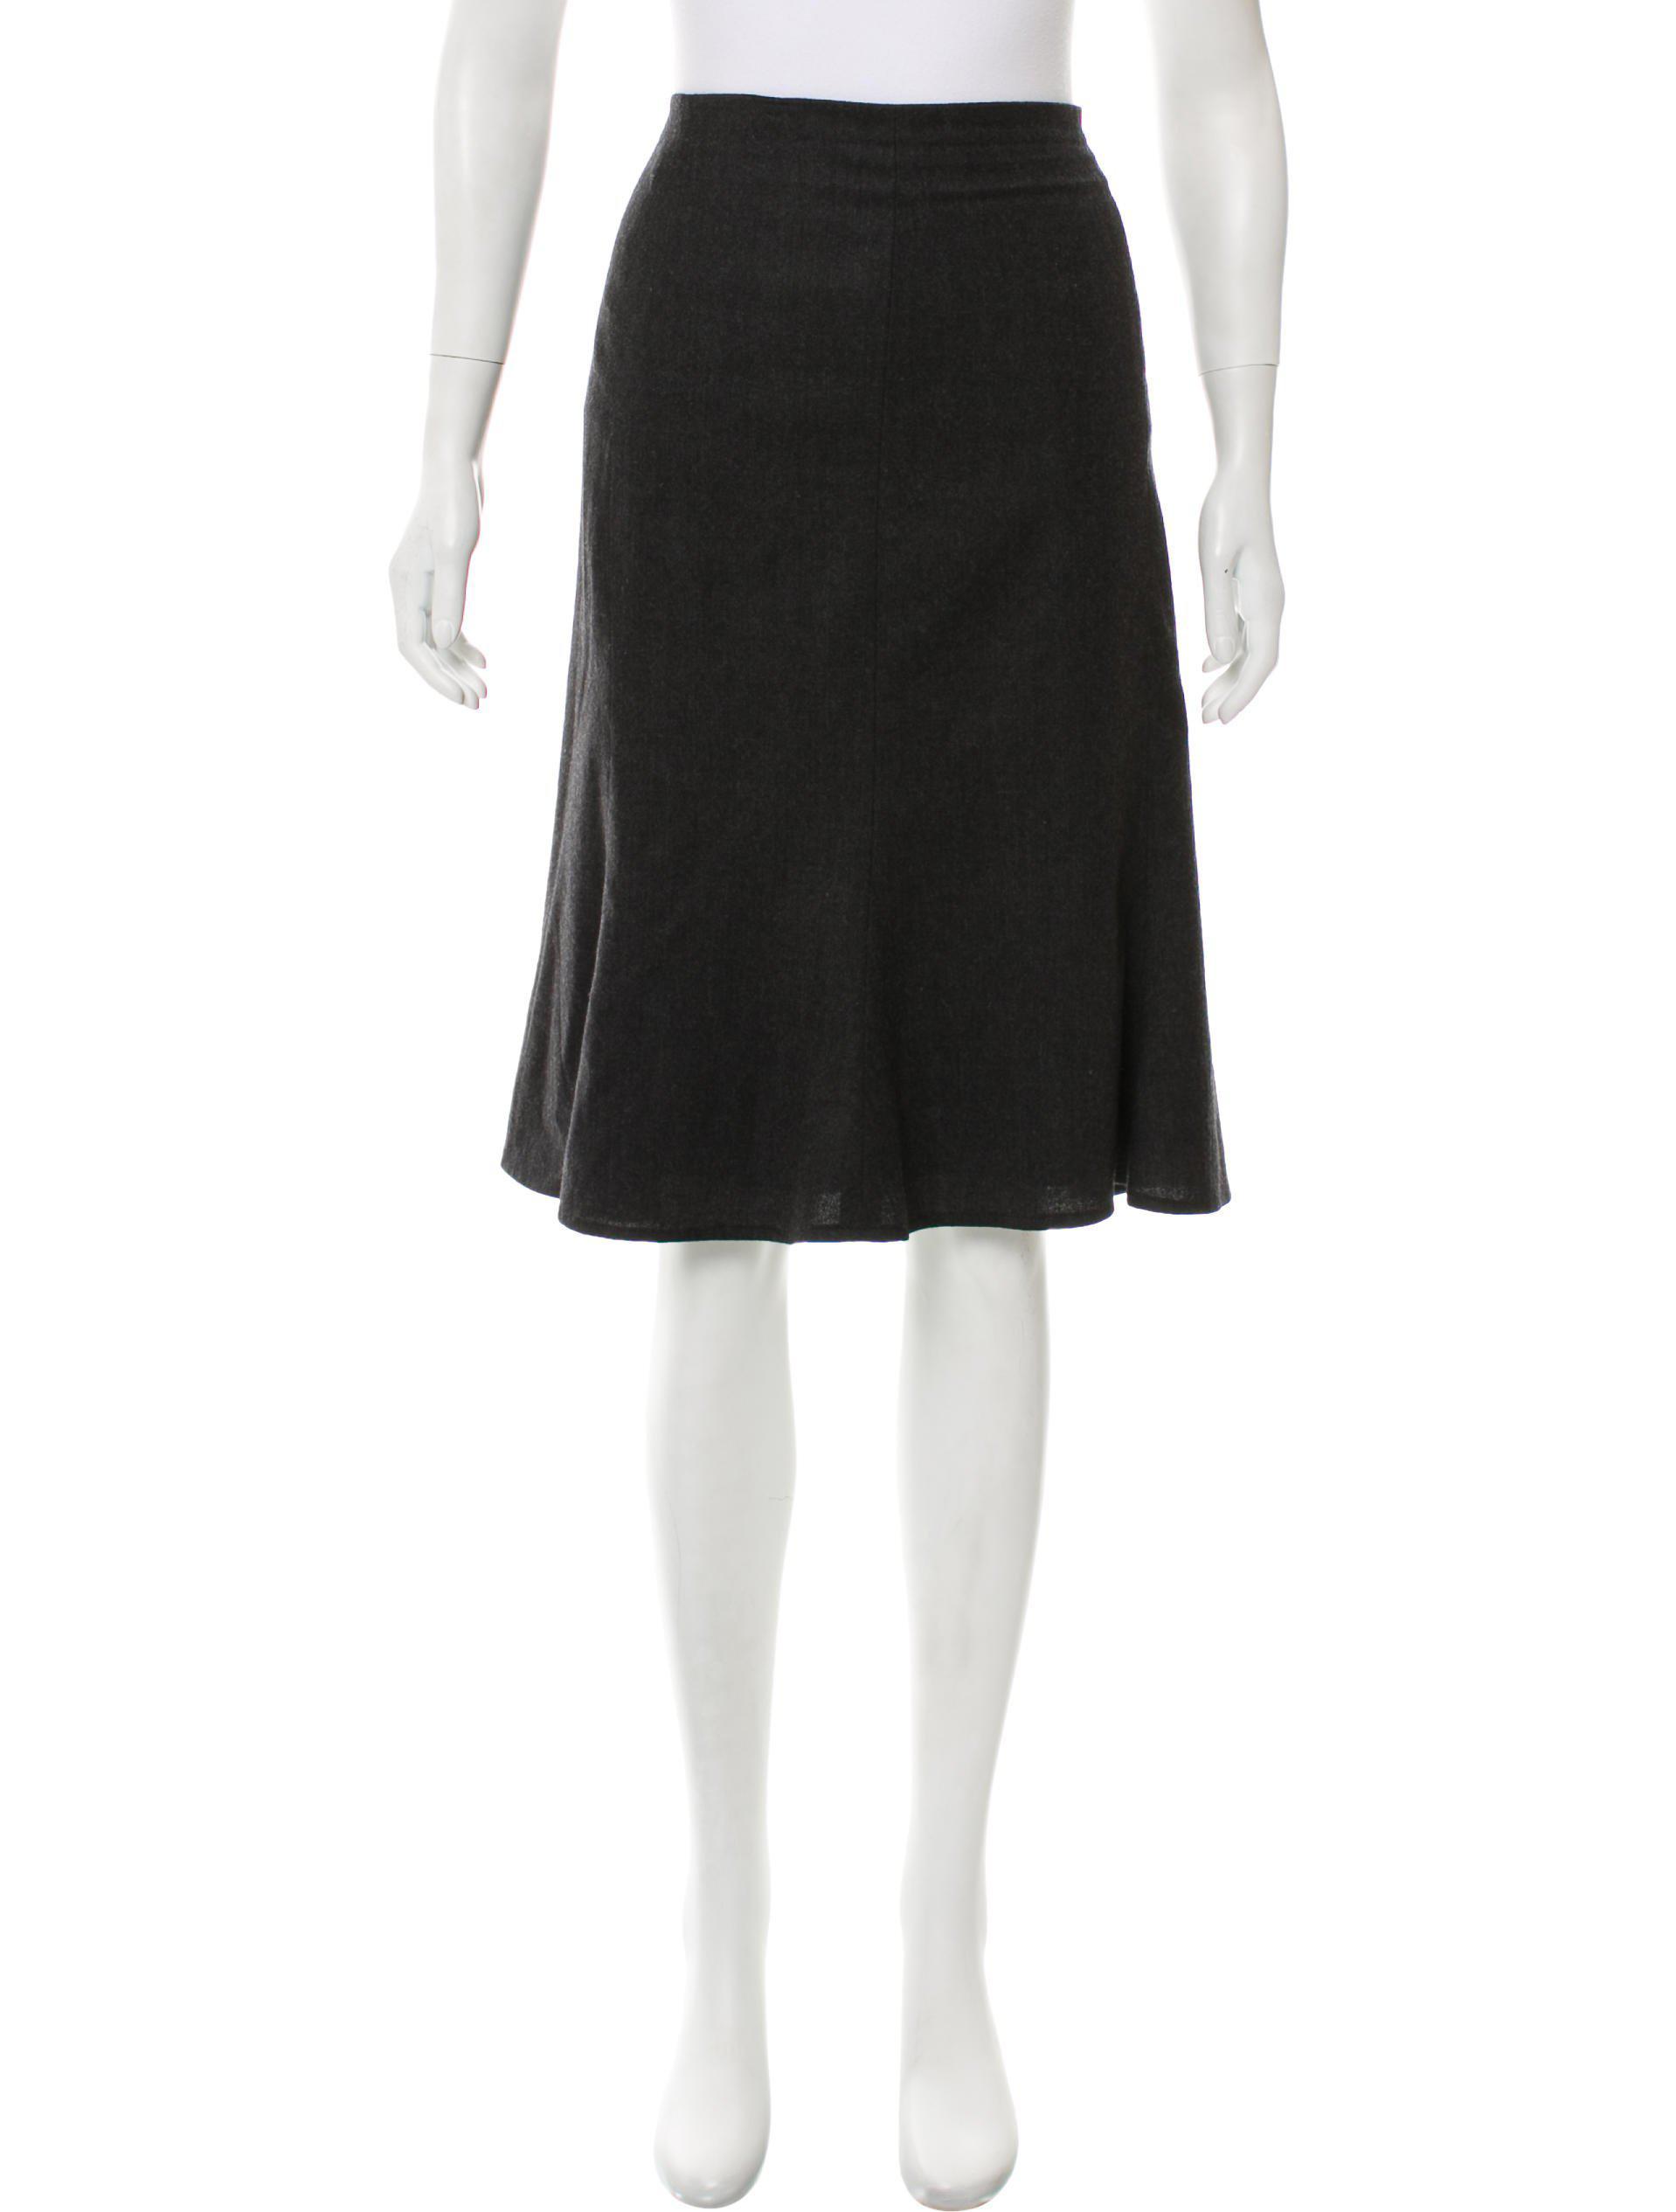 e6a57b96f0 Lyst - Carolina Herrera Wool Knee-length Skirt Grey in Gray